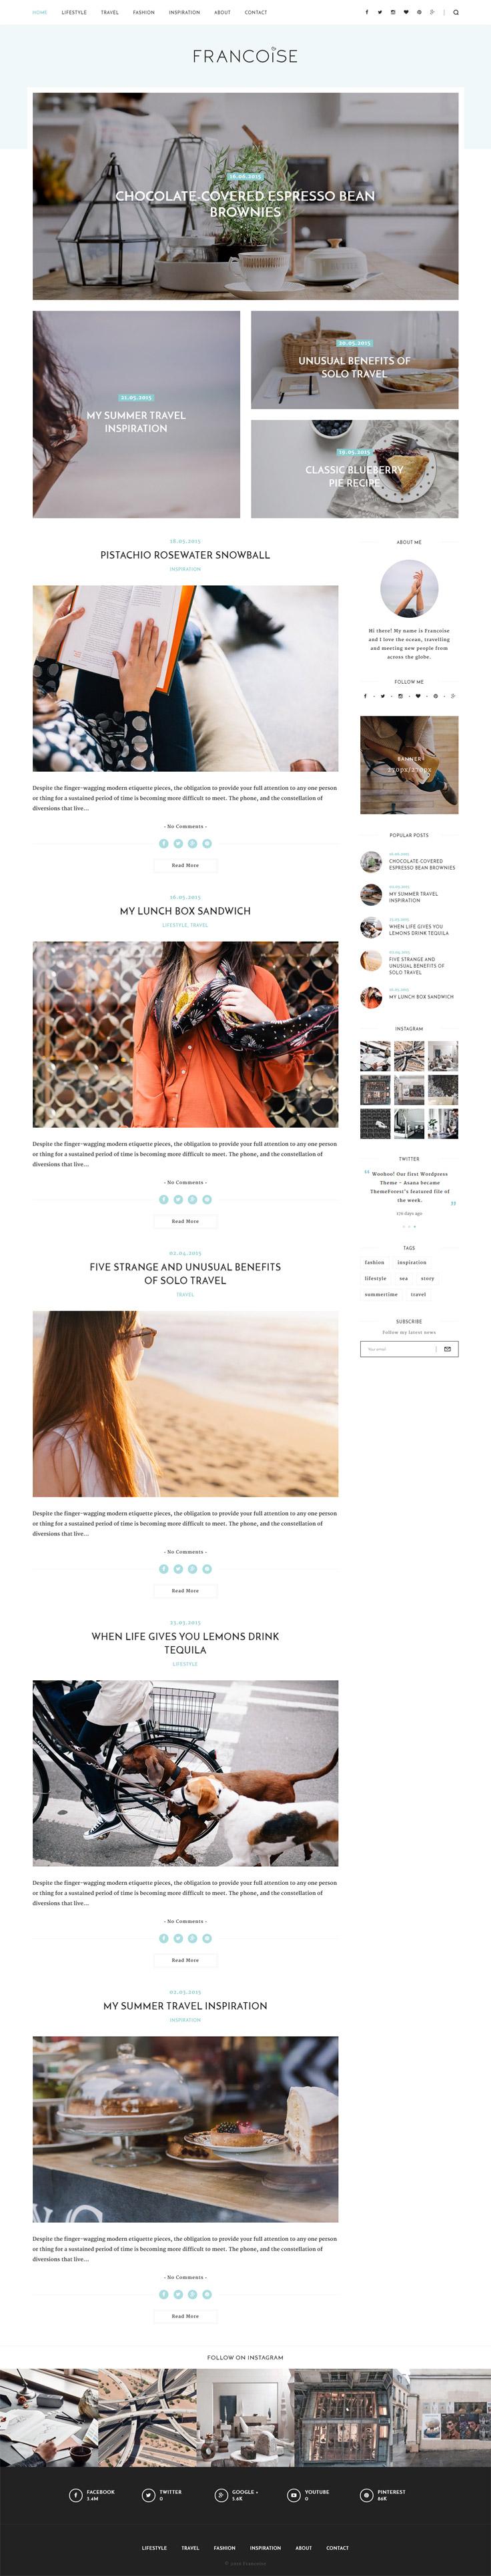 10 Uniquely Designed Personal Wordpress Themes Blog Themes Wordpress Blog Themes Wordpress Blog